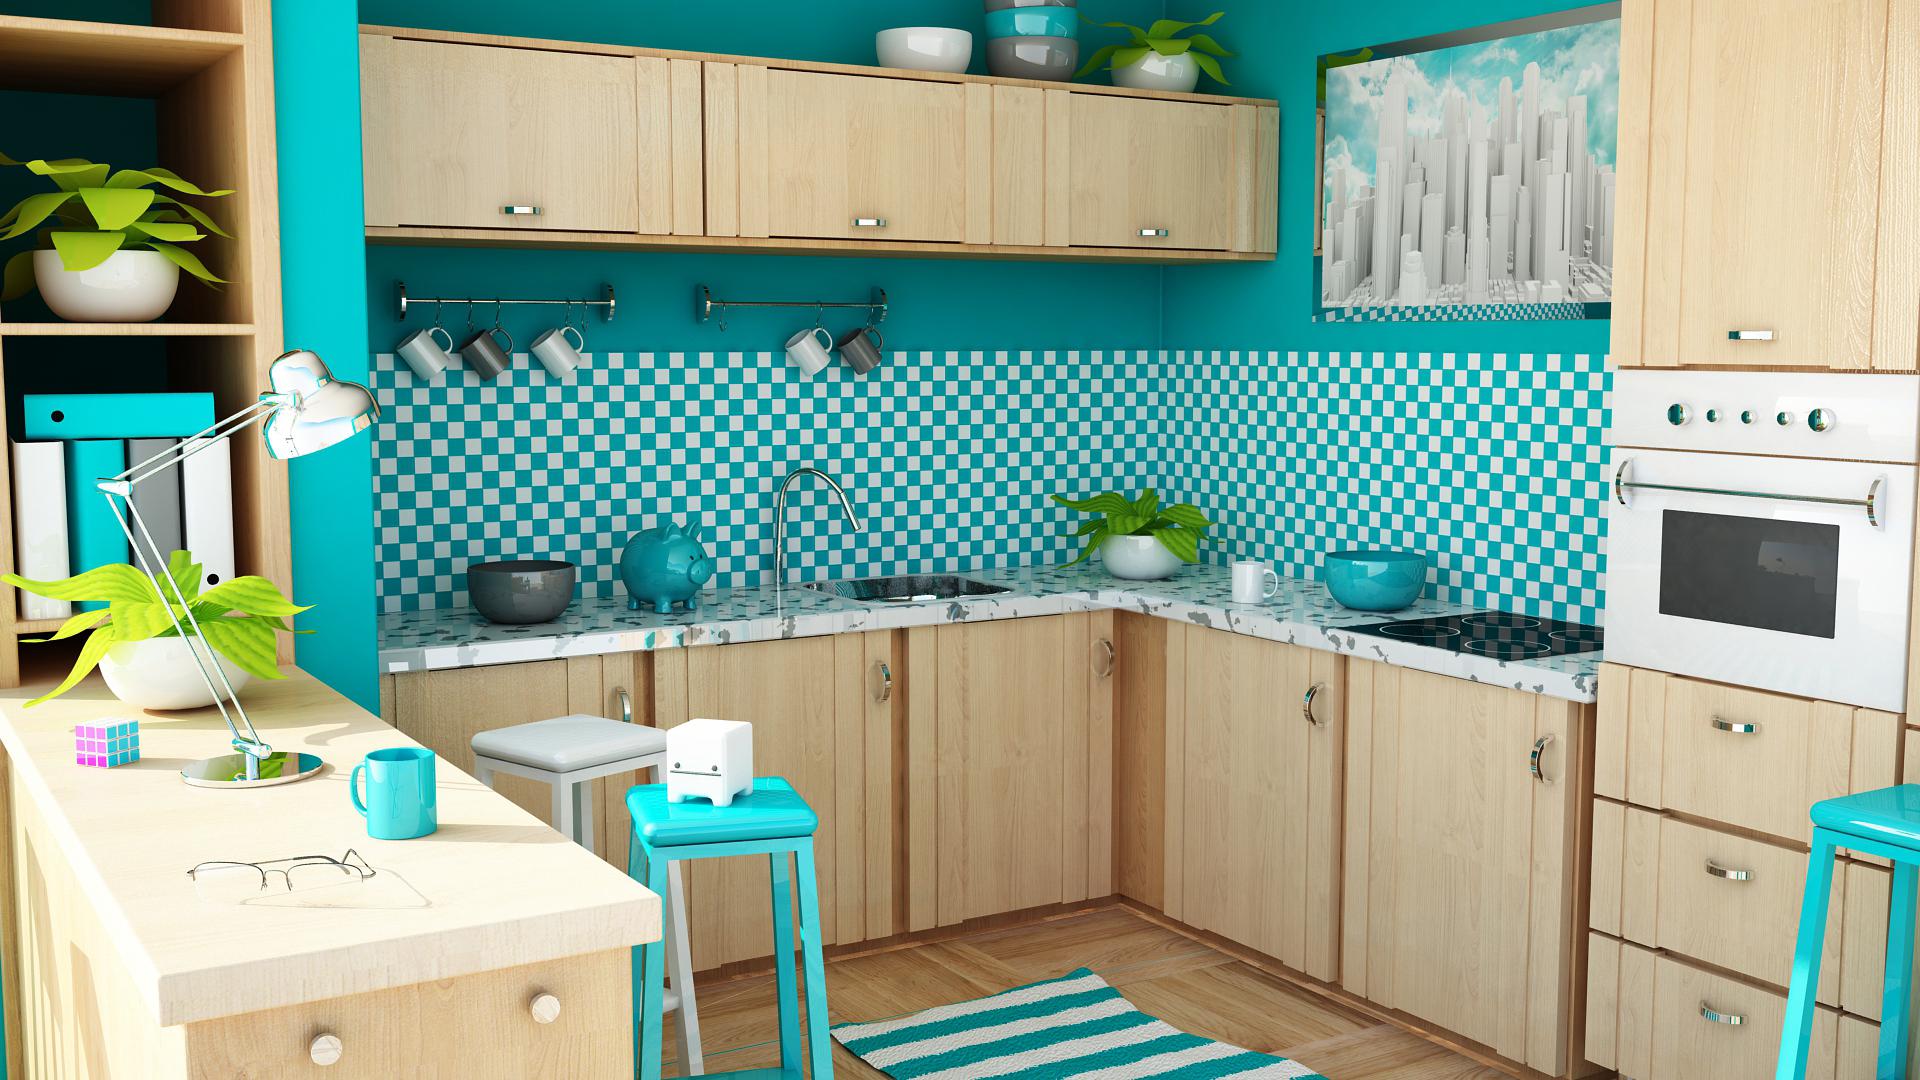 Download Kitchen Wallpaper 15 1920x1080 49 Images Of Kitchen